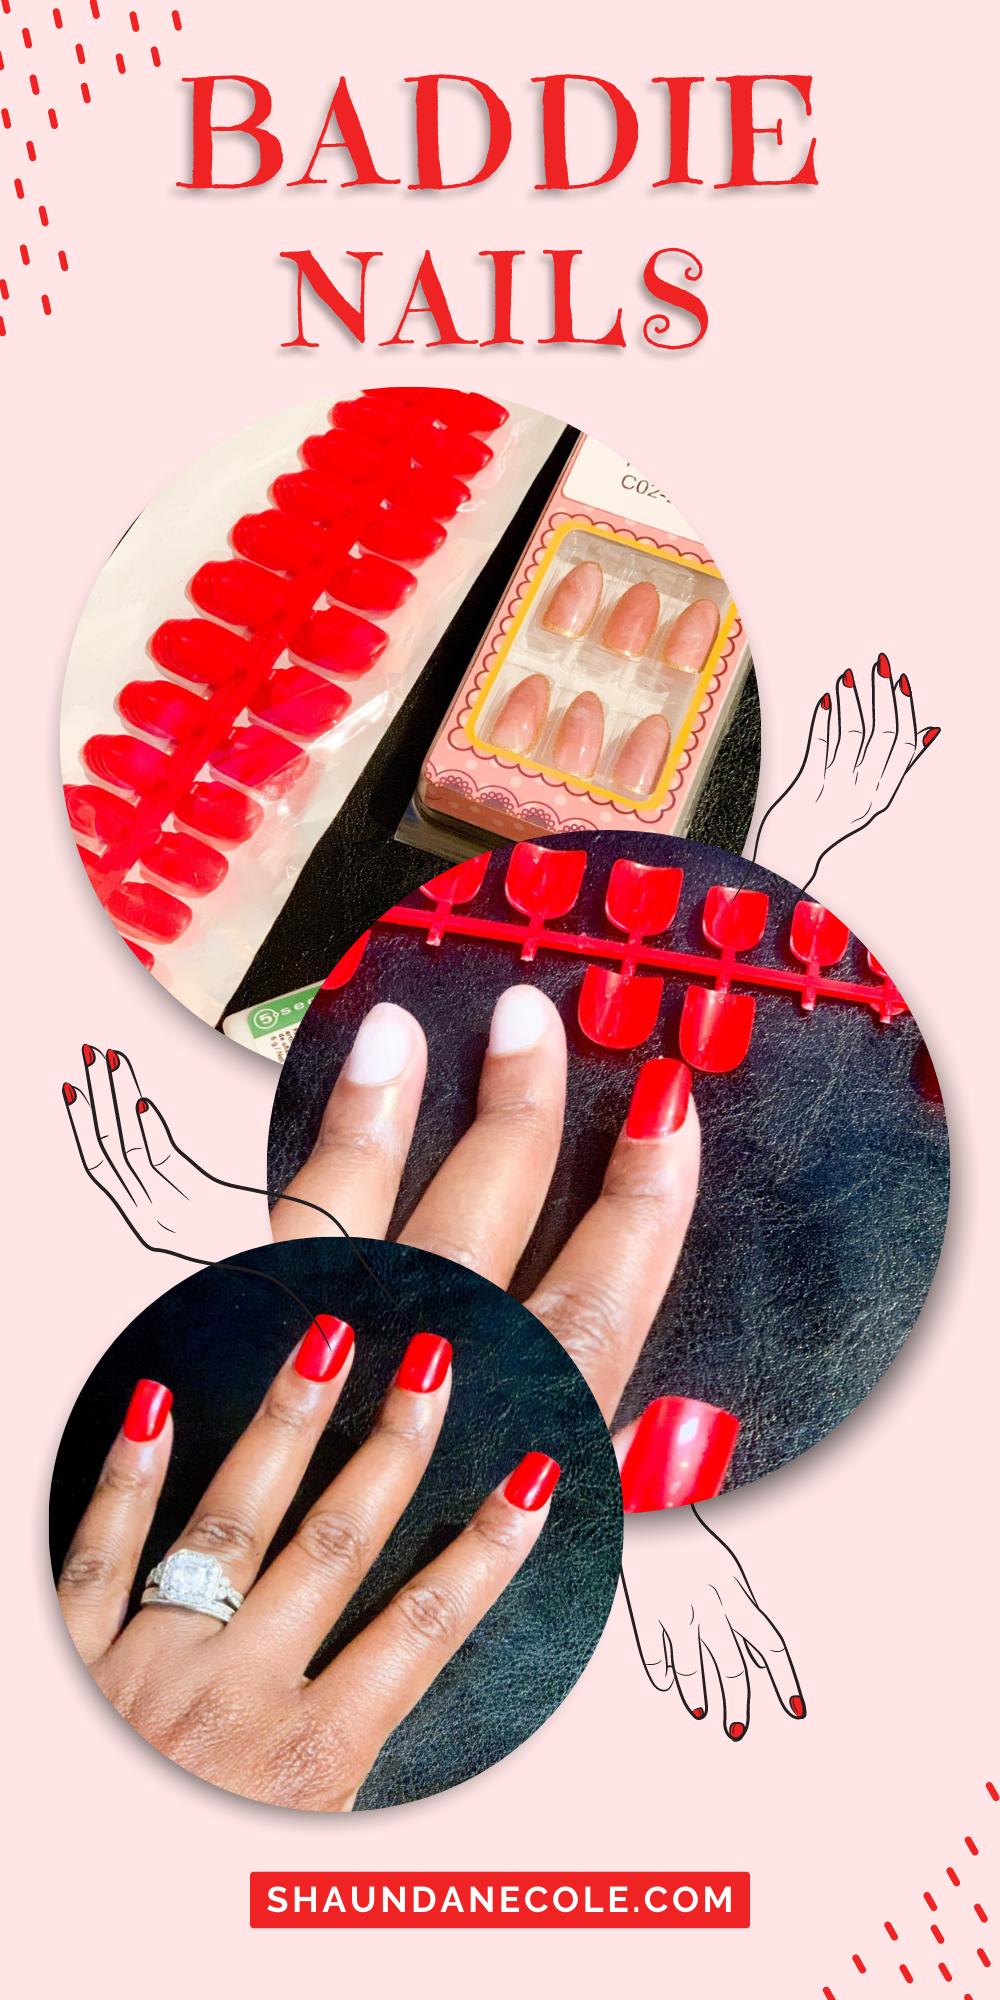 Baddie Nails Acrylic Ideas, Gel Nails, Nail Designs,  Pretty Long Nails Coffin, Almond & Spring 2021